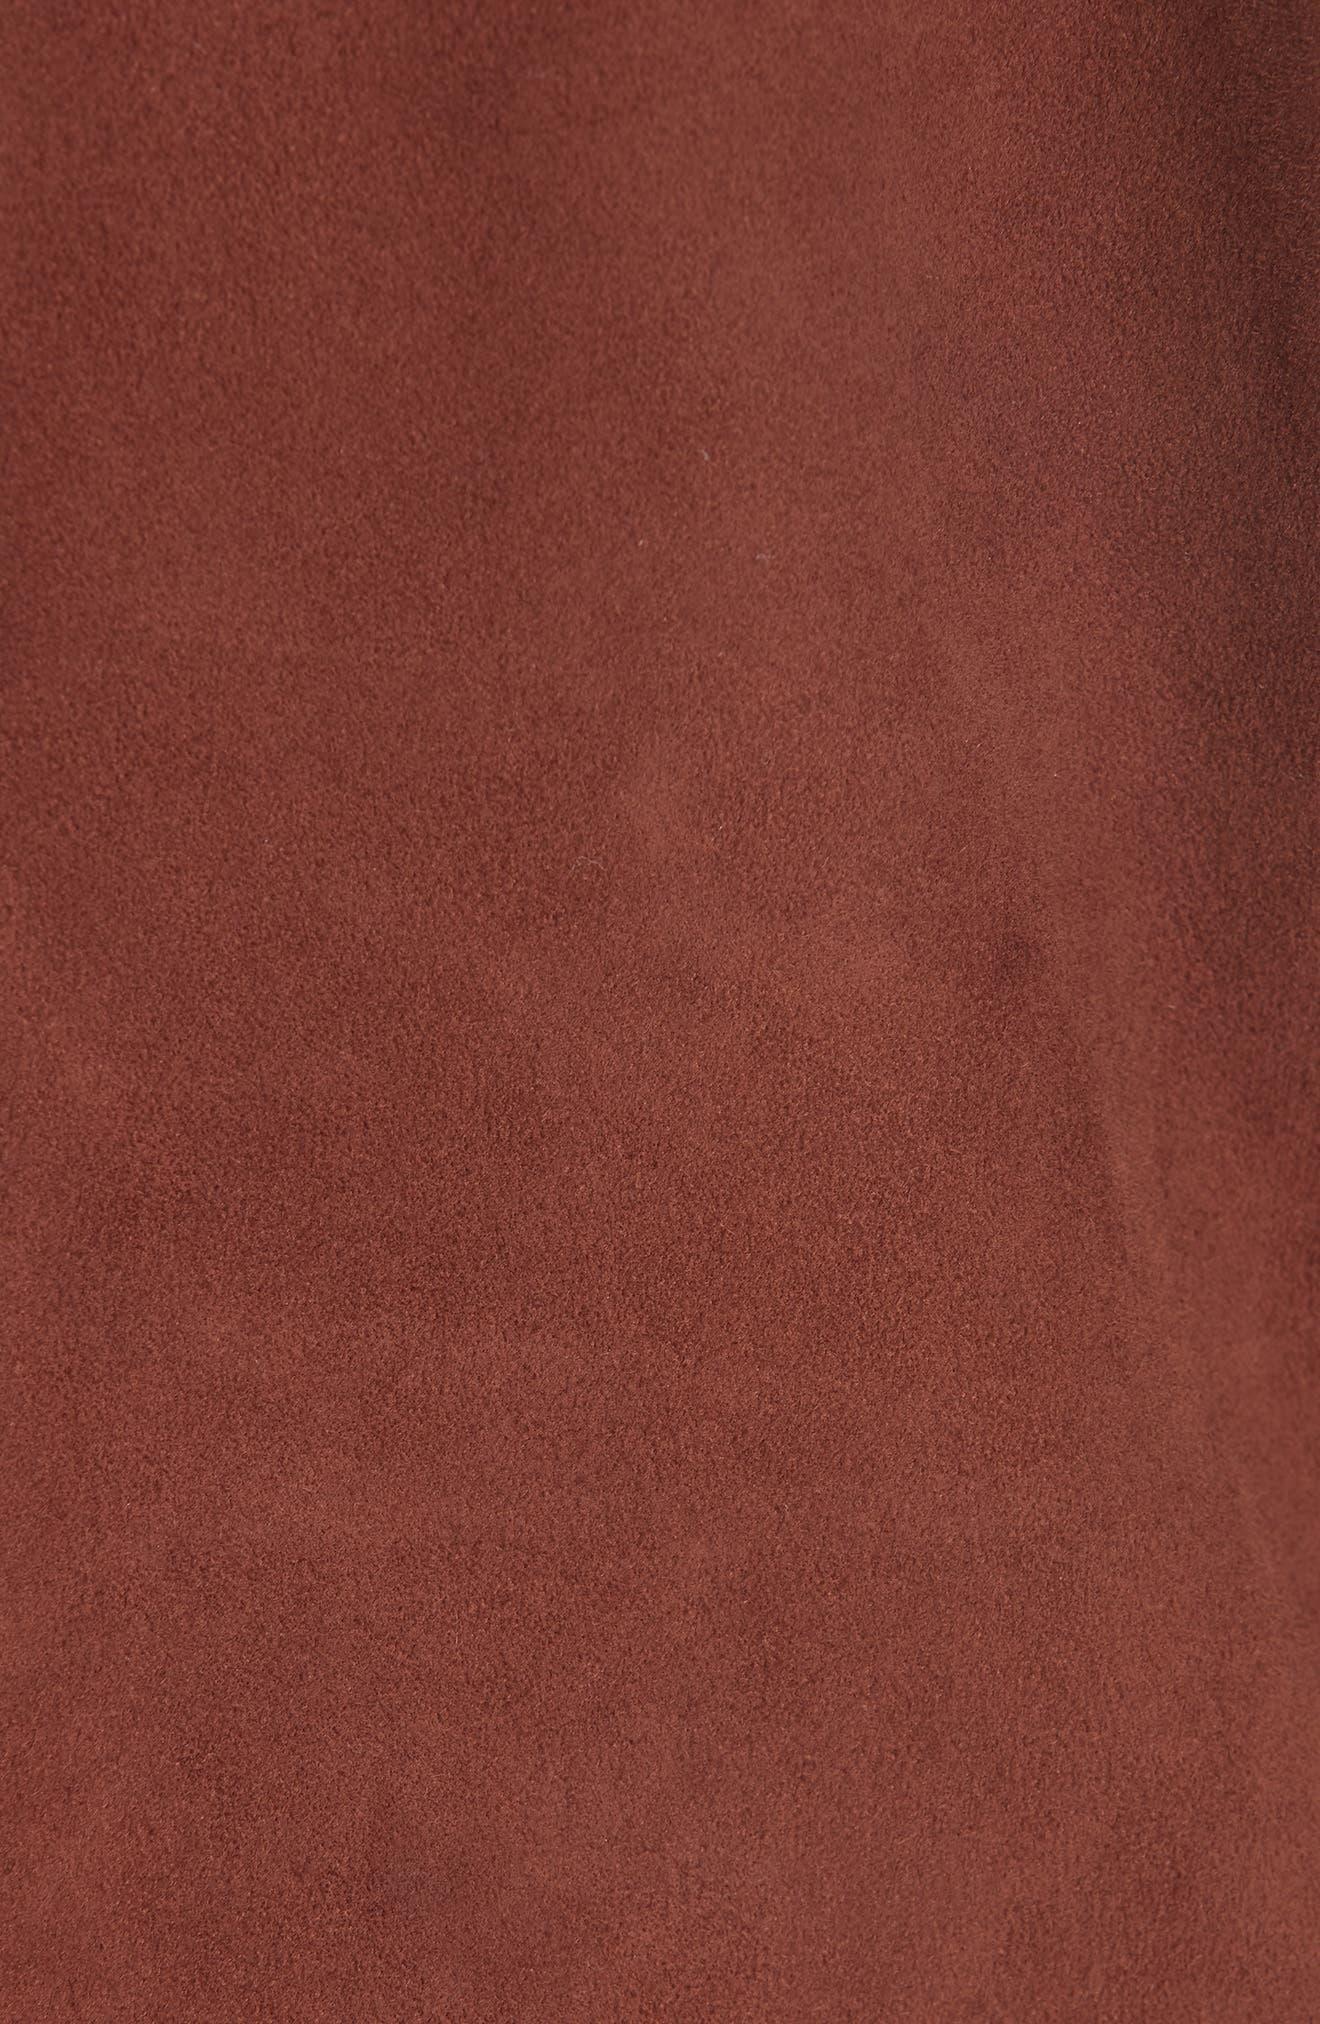 Asymmetrical Zip Suede Jacket,                             Alternate thumbnail 6, color,                             NUTMEG